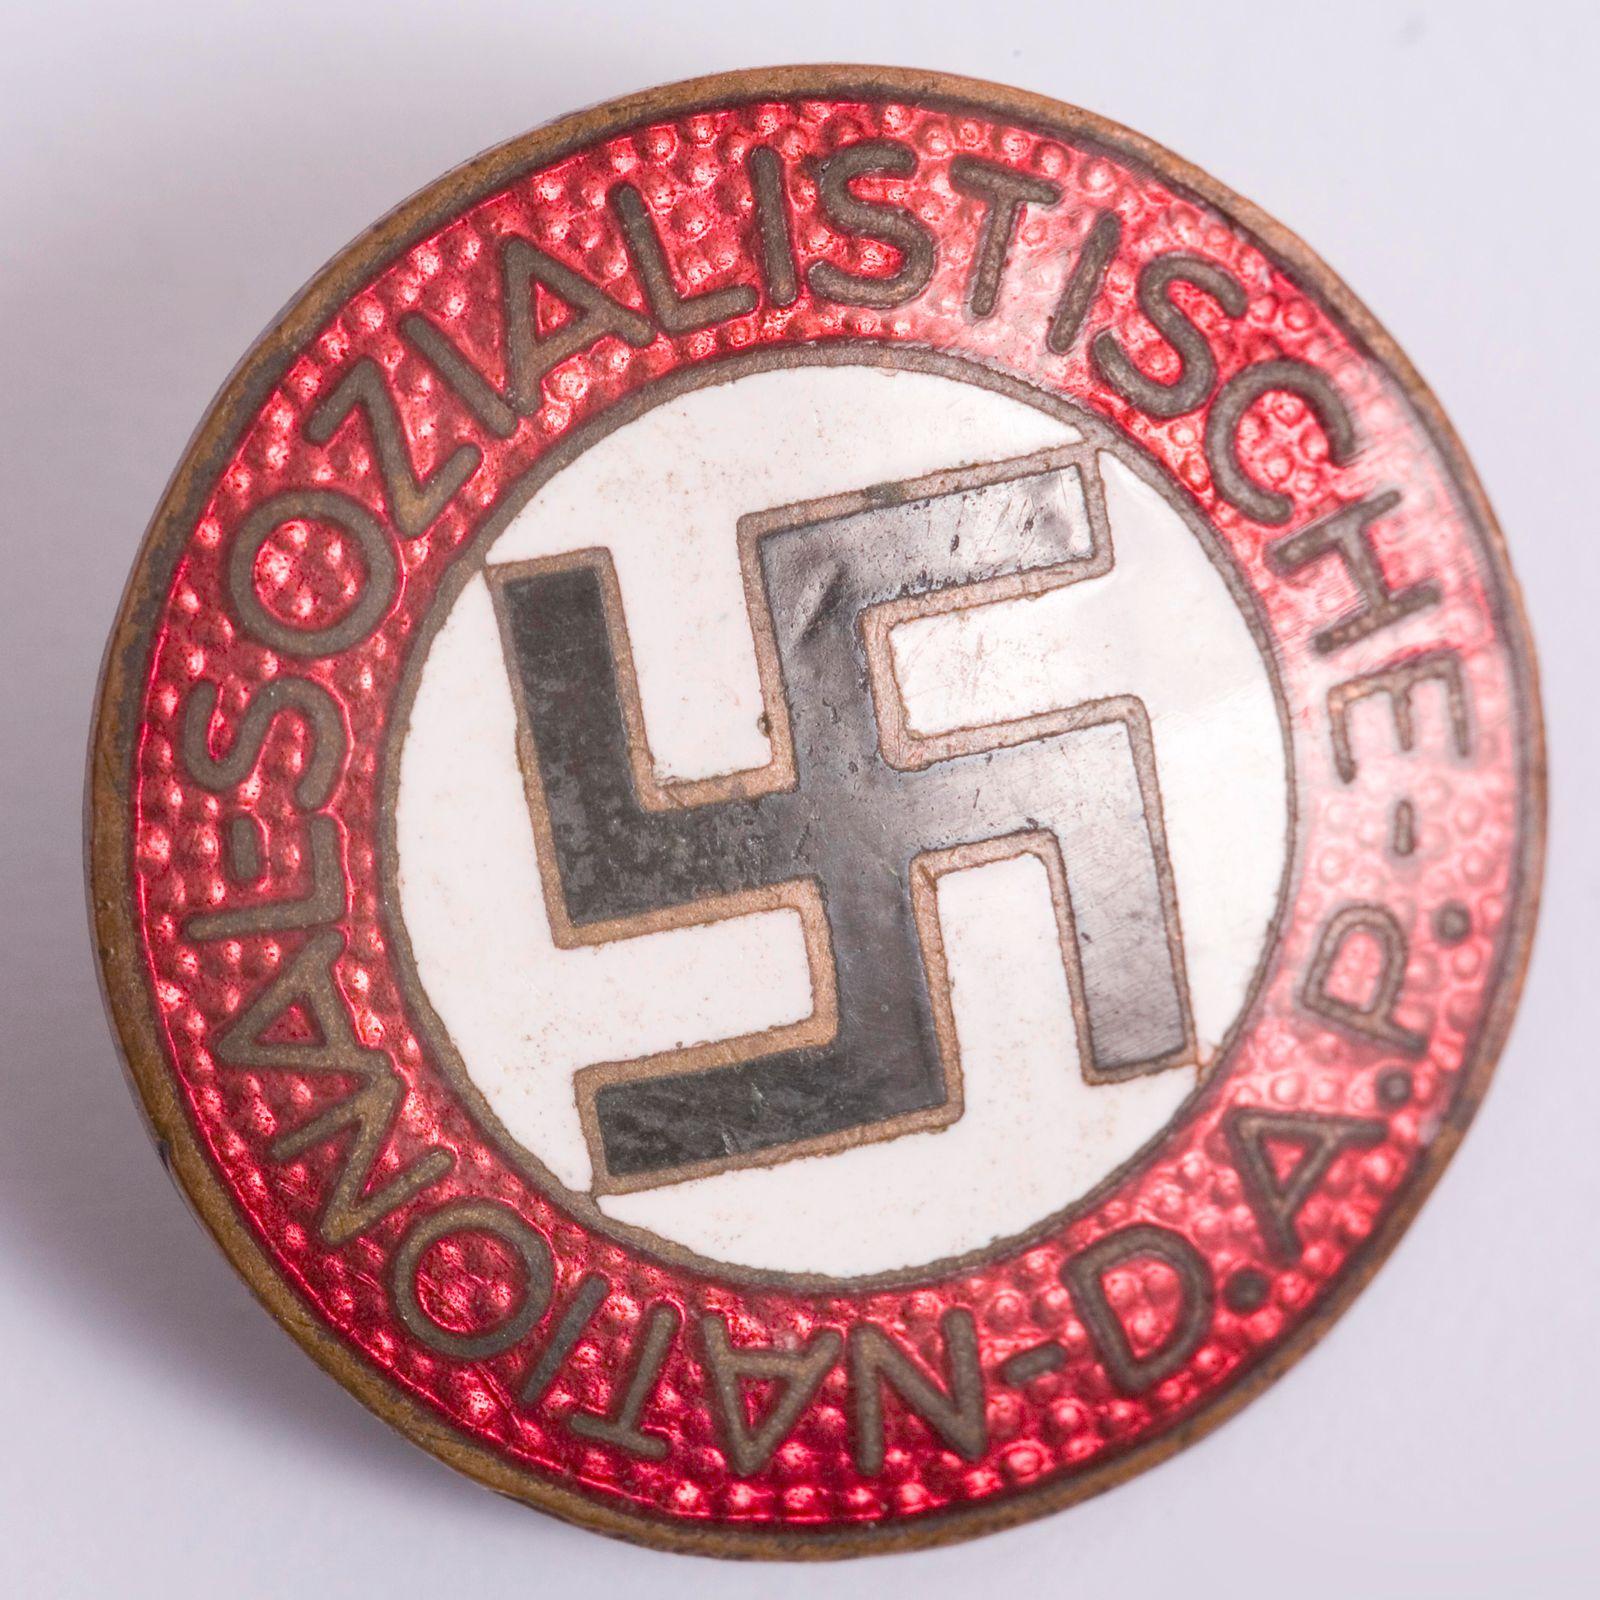 Order of second world war